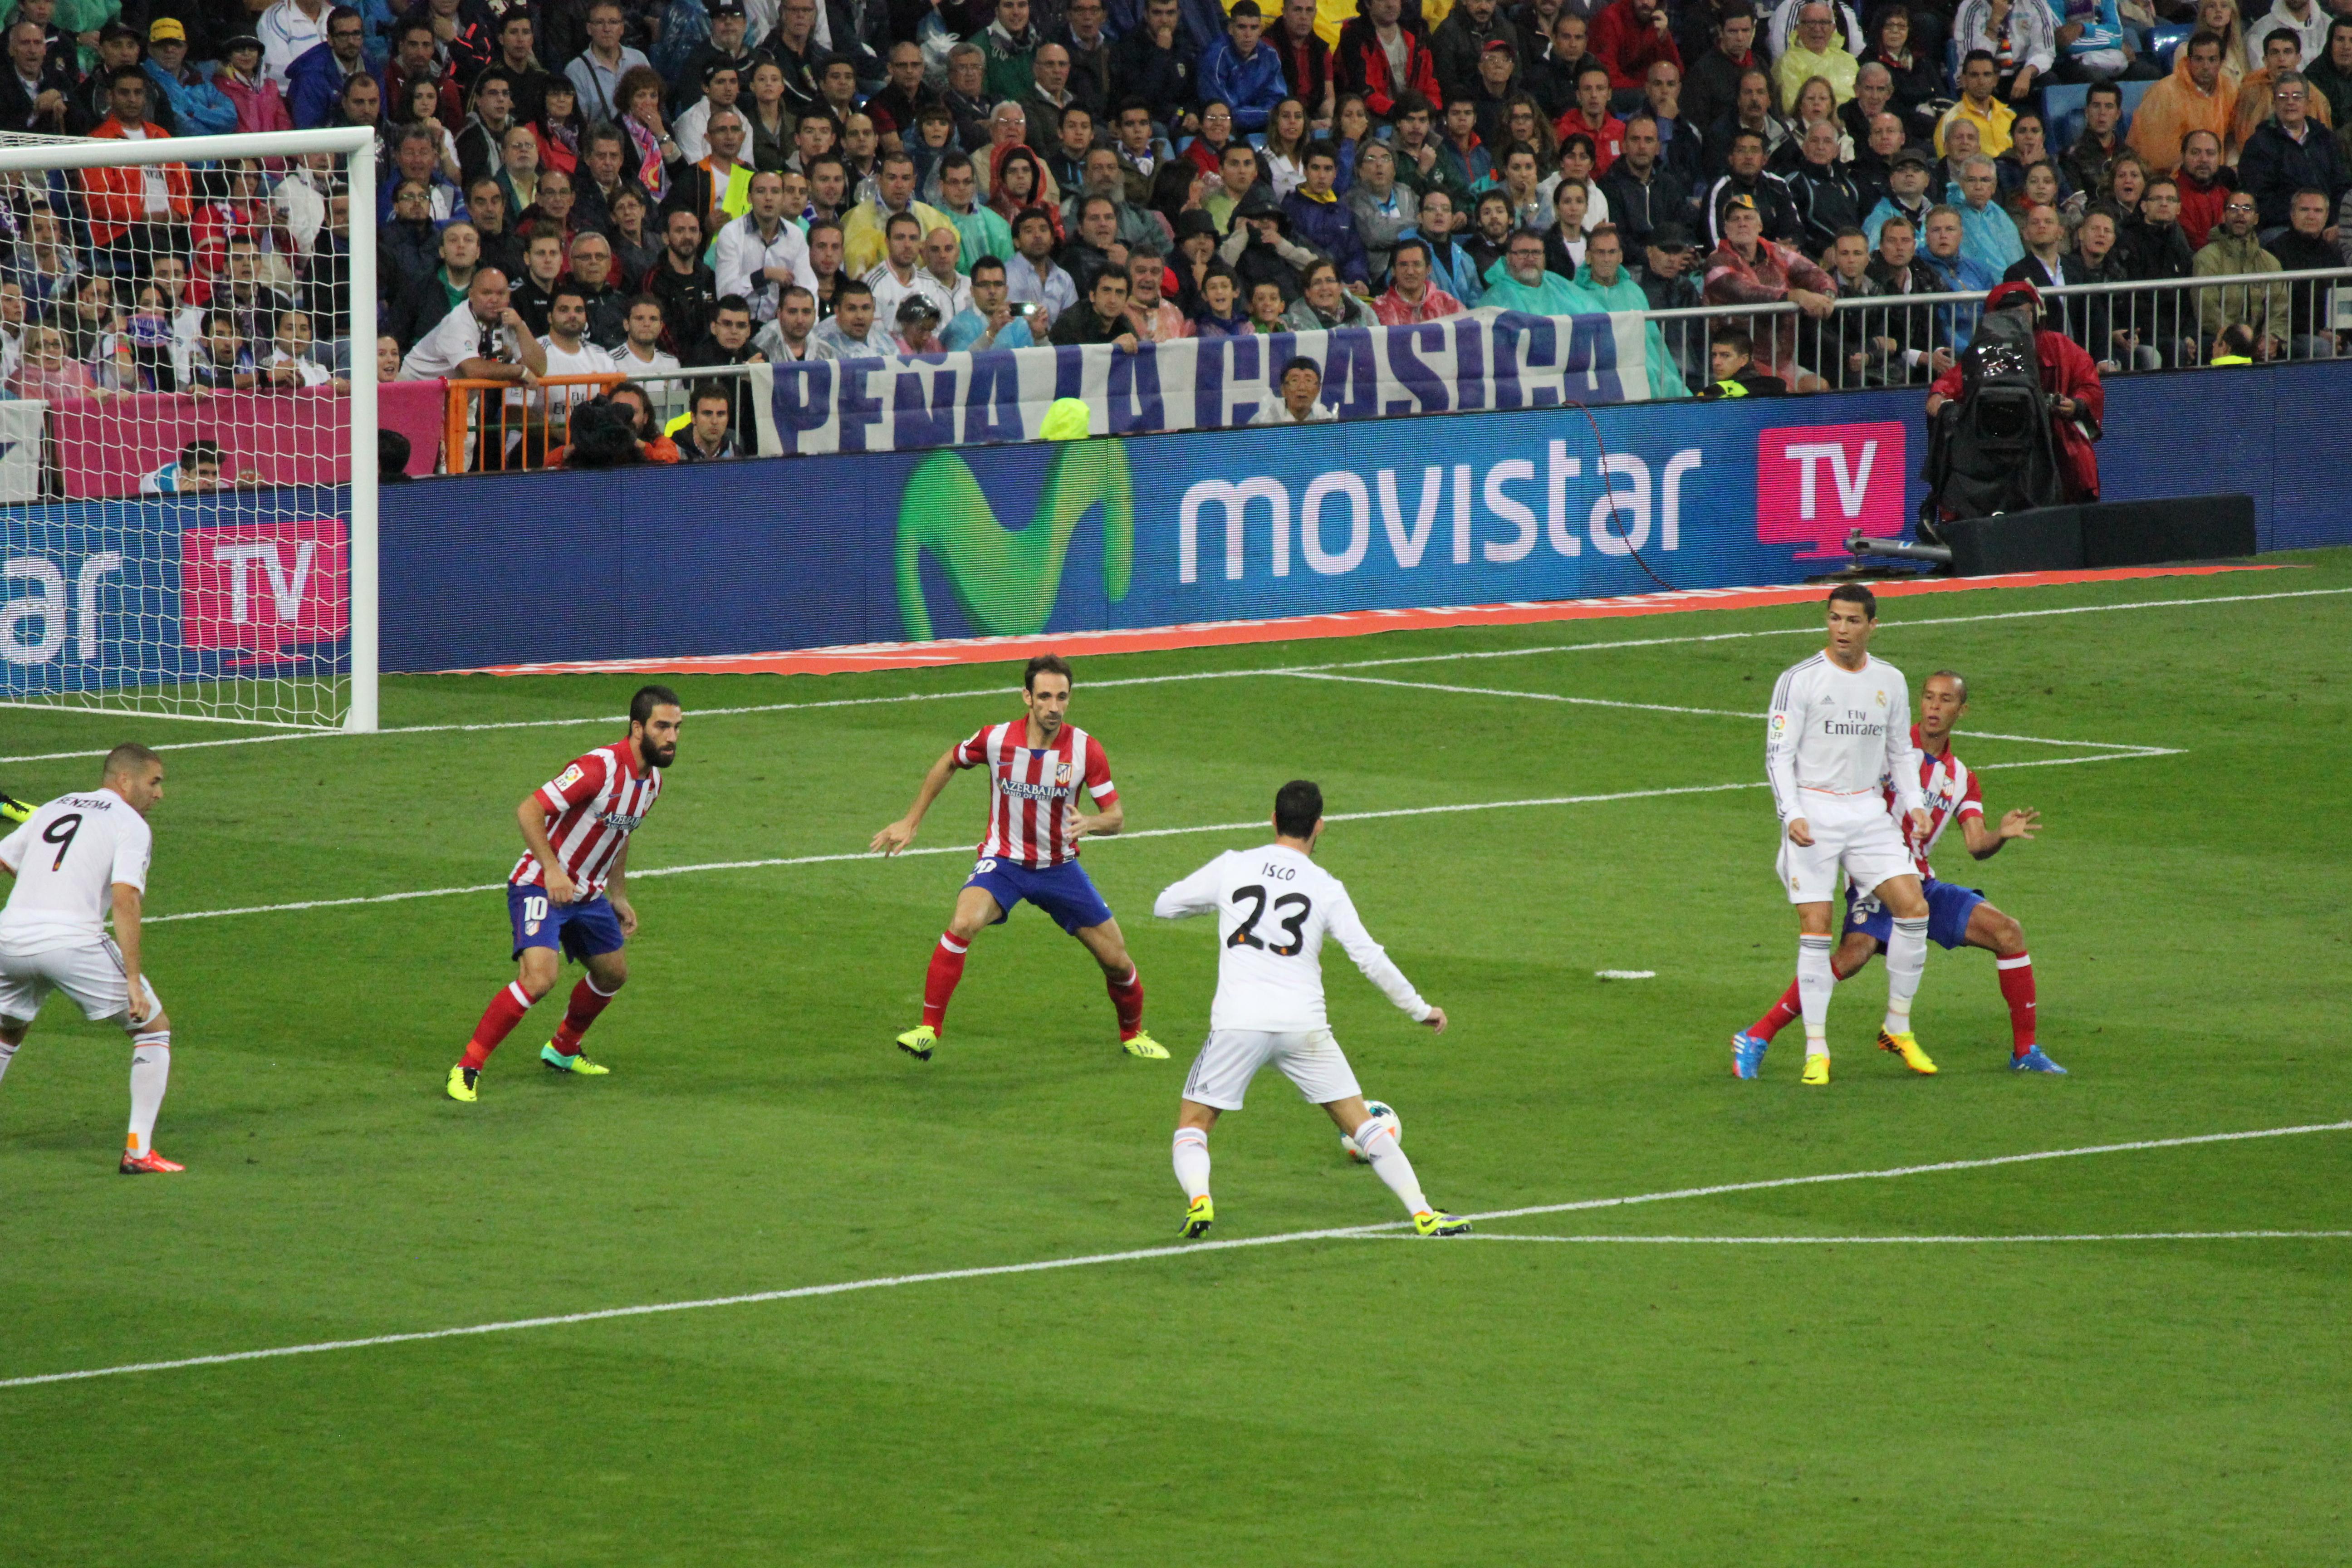 File:Real Madrid vs. Atlético Madrid September 28, 2013 04.JPG - Wikimedia Commons